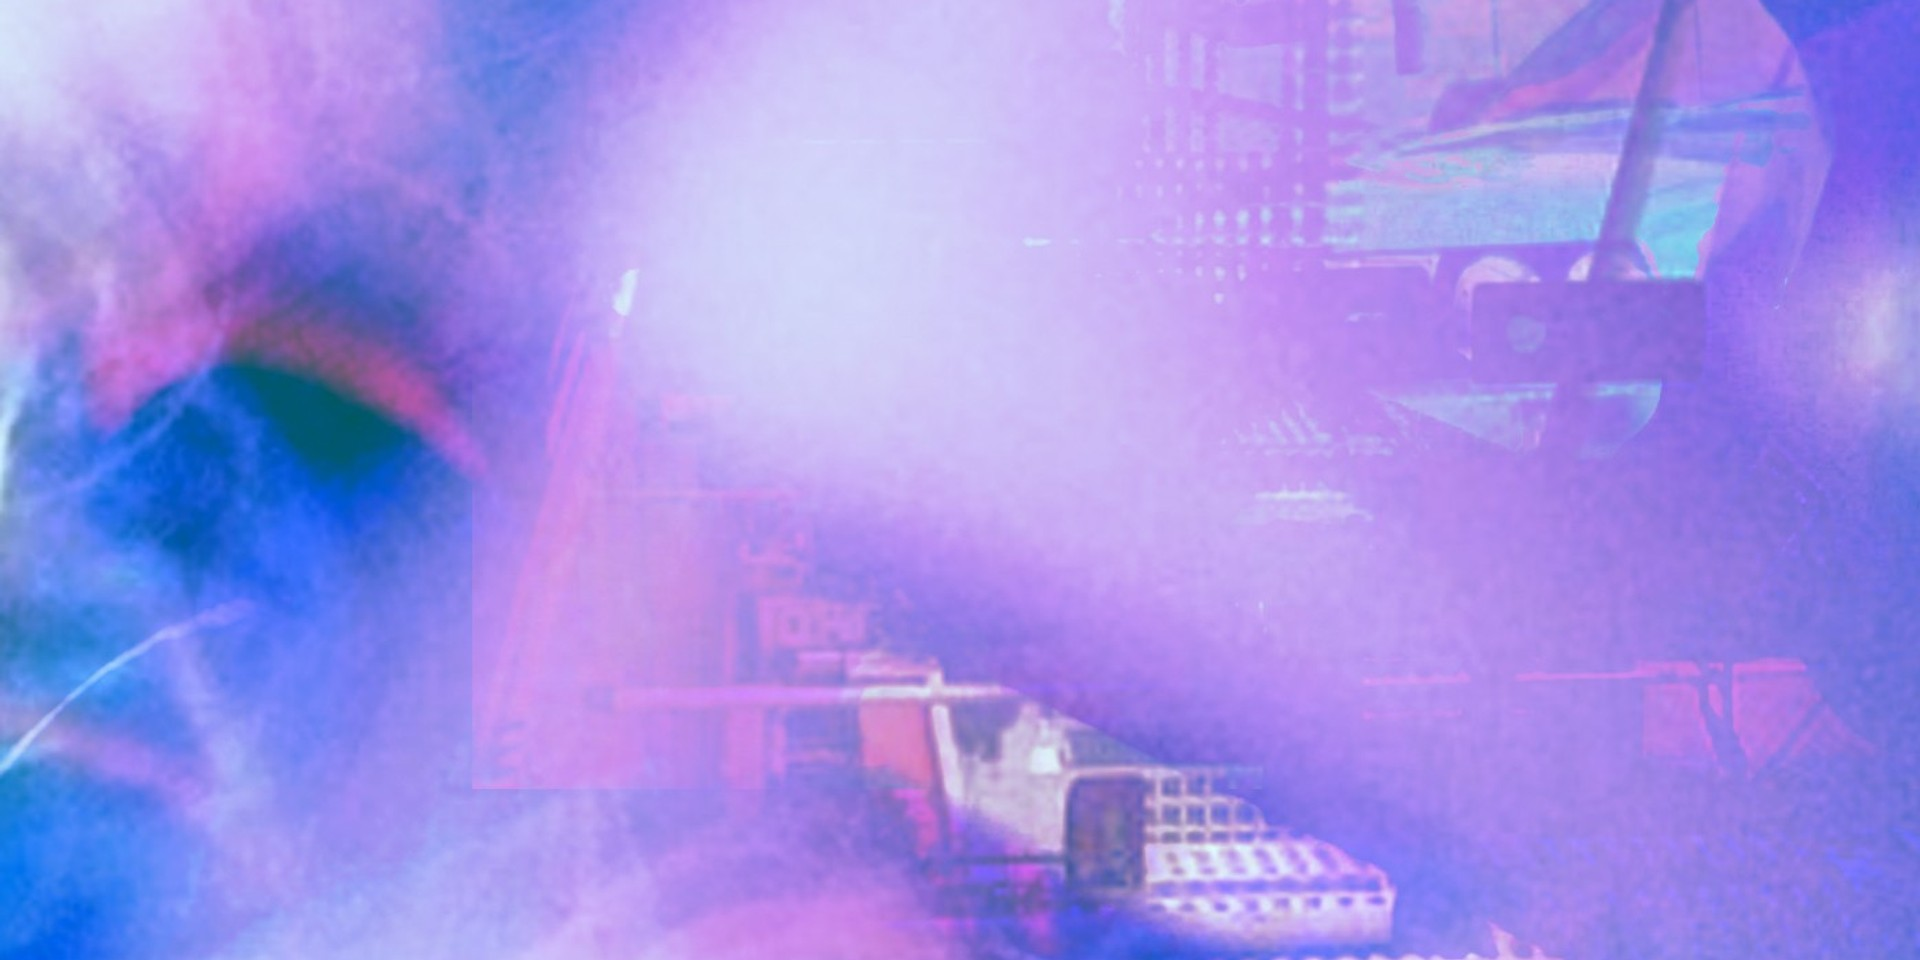 Moon Mask unveil new single 'Boulevard' – listen